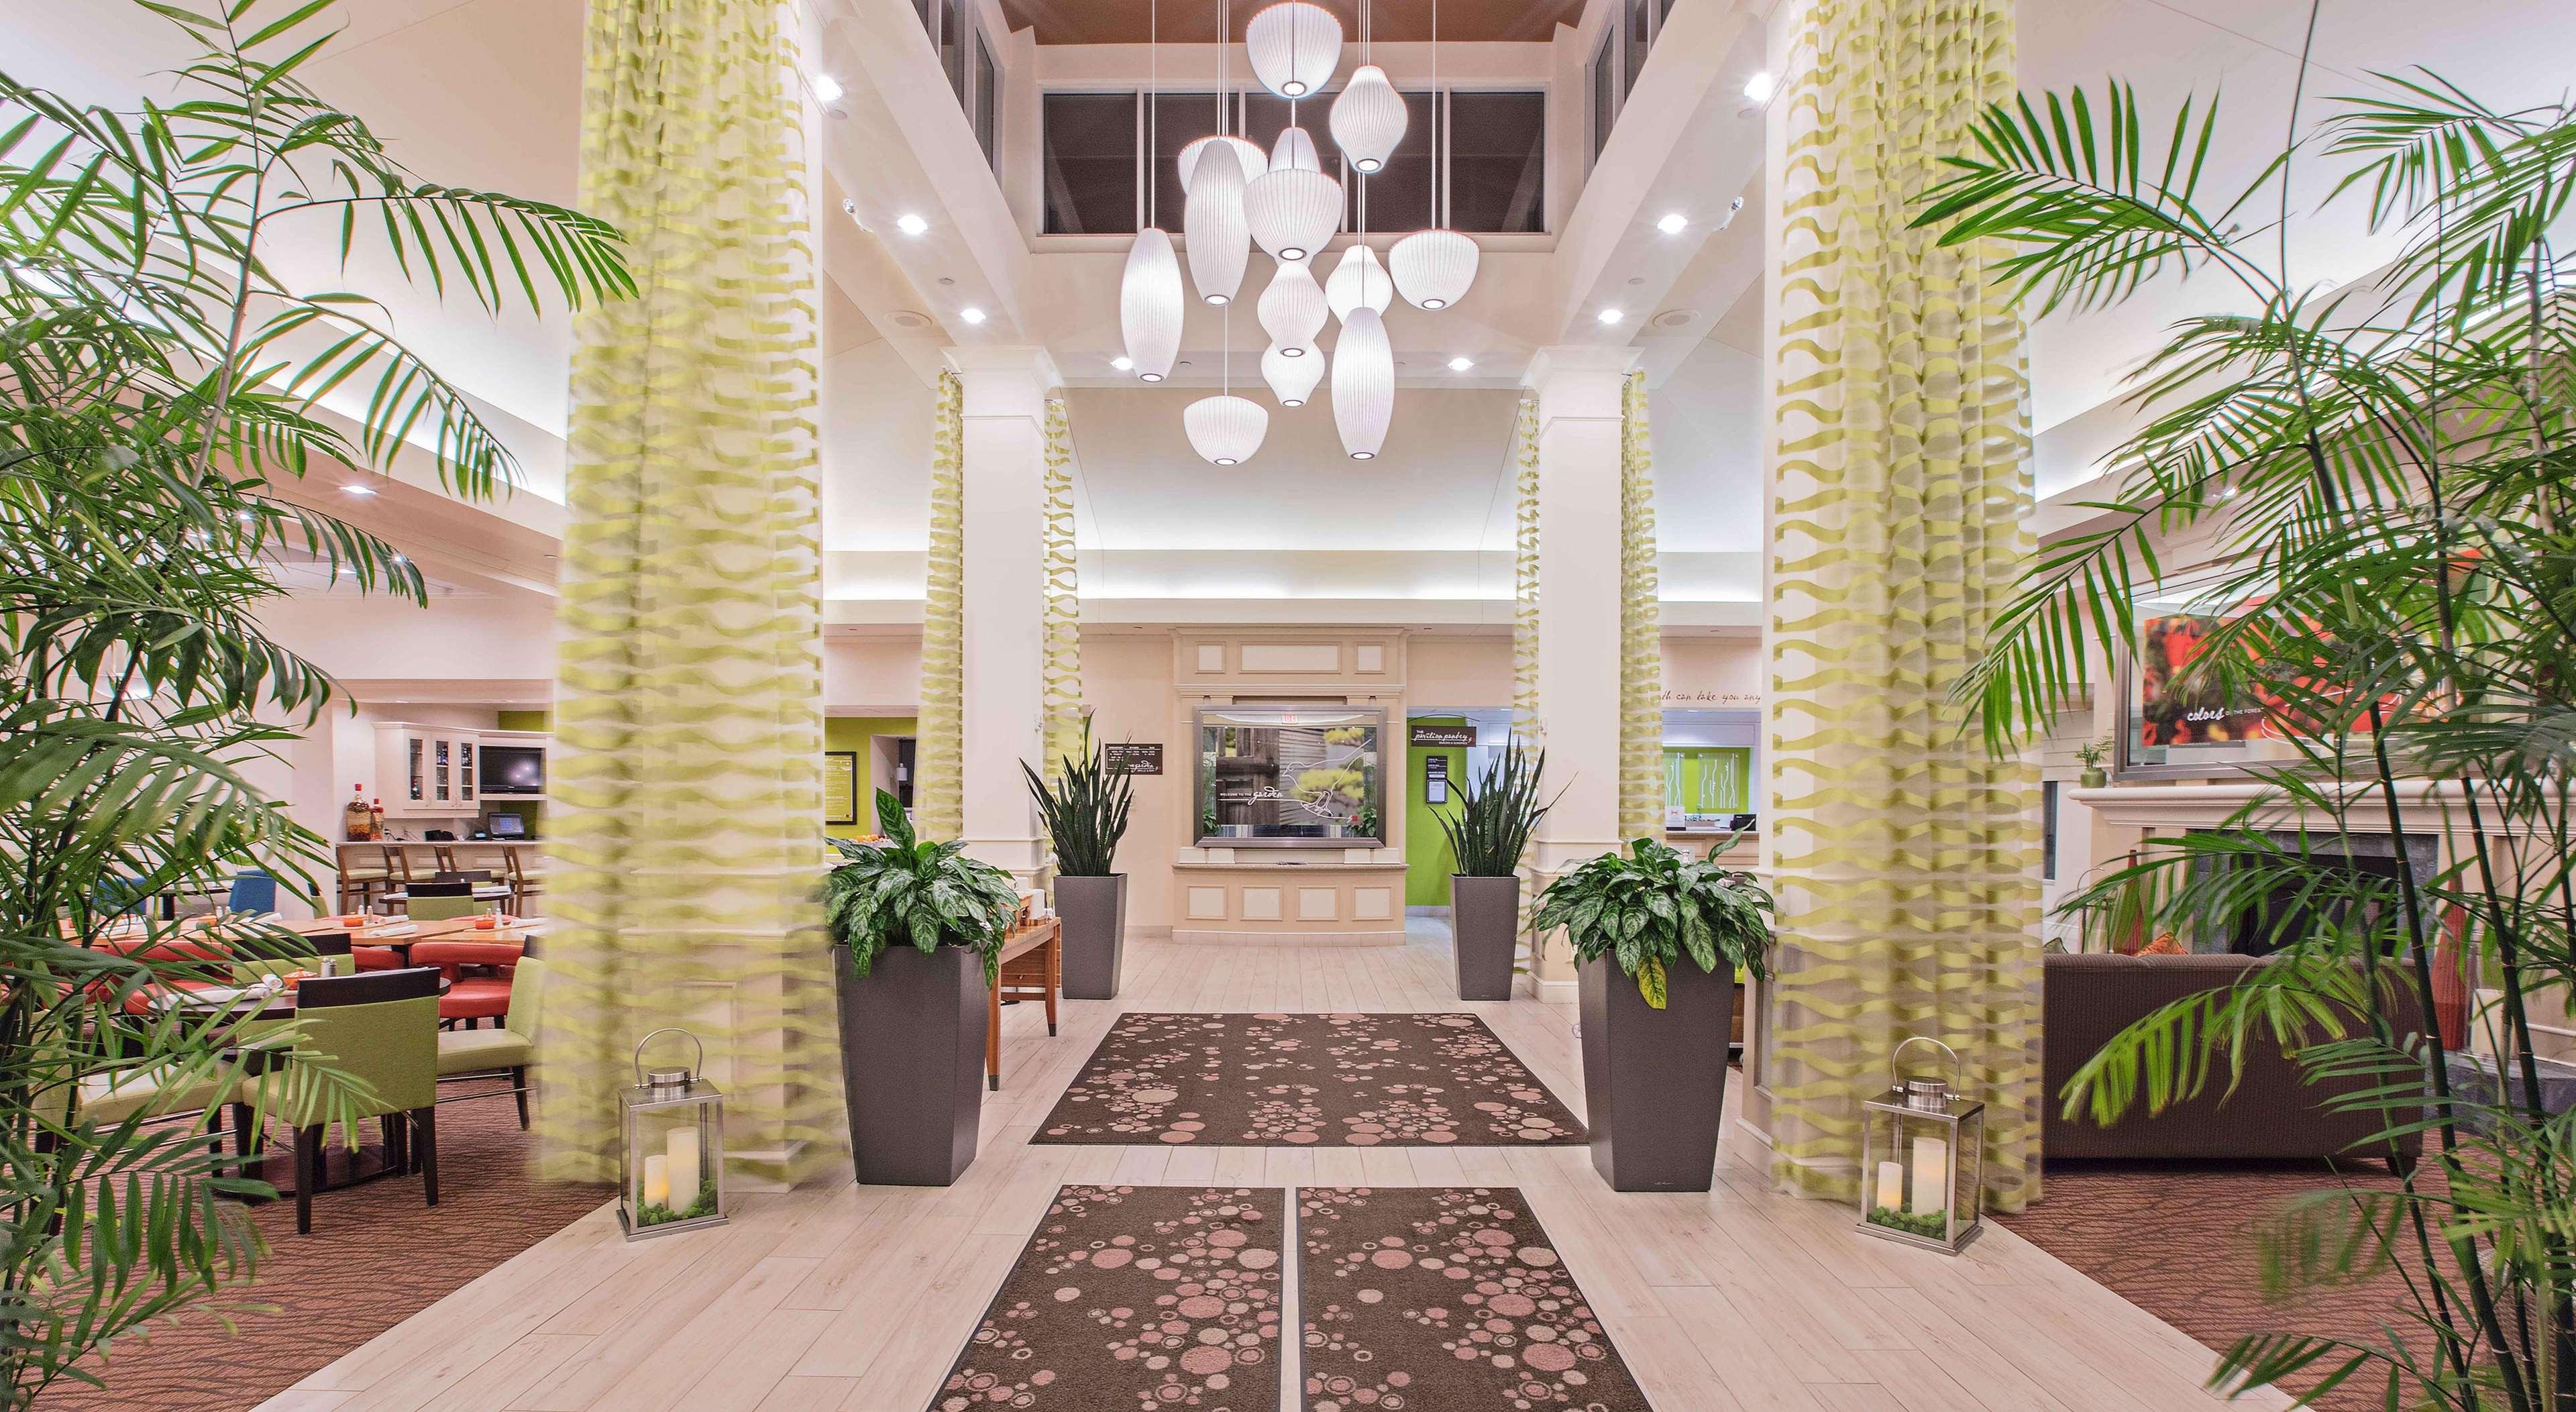 Hilton Garden Inn Des Moines Urbandale Johnston Ia Business Directory